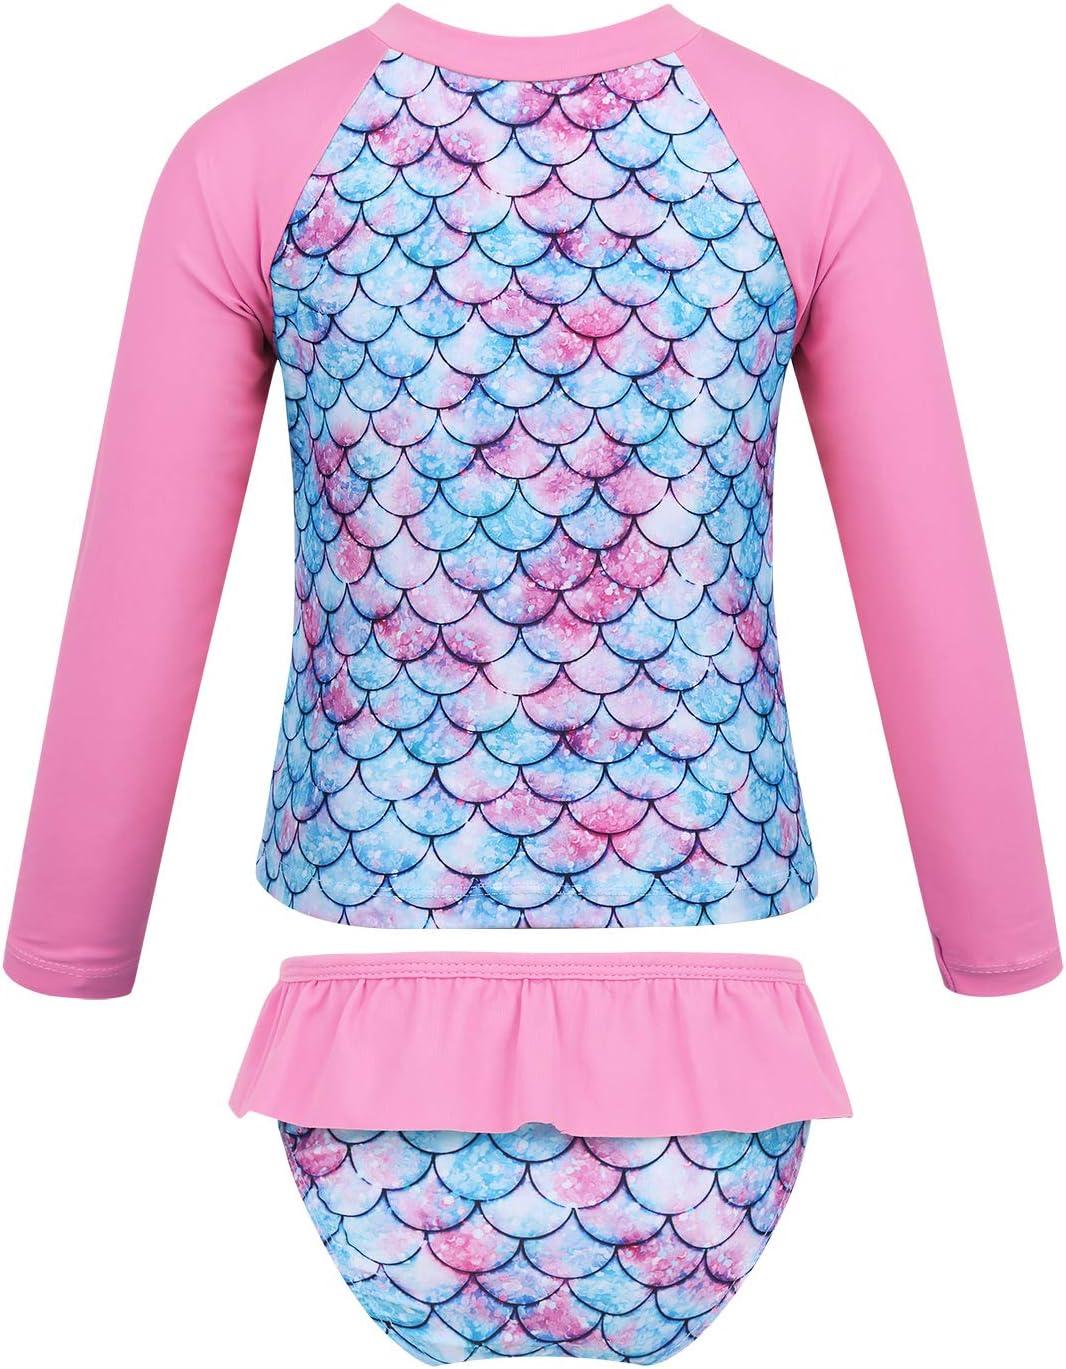 Rash Guard Set MSemis Kids Girls 2 Pieces Tankini Swimsuit Floral Print Long Sleeves Wetsuit Bathing Suit UPF 50